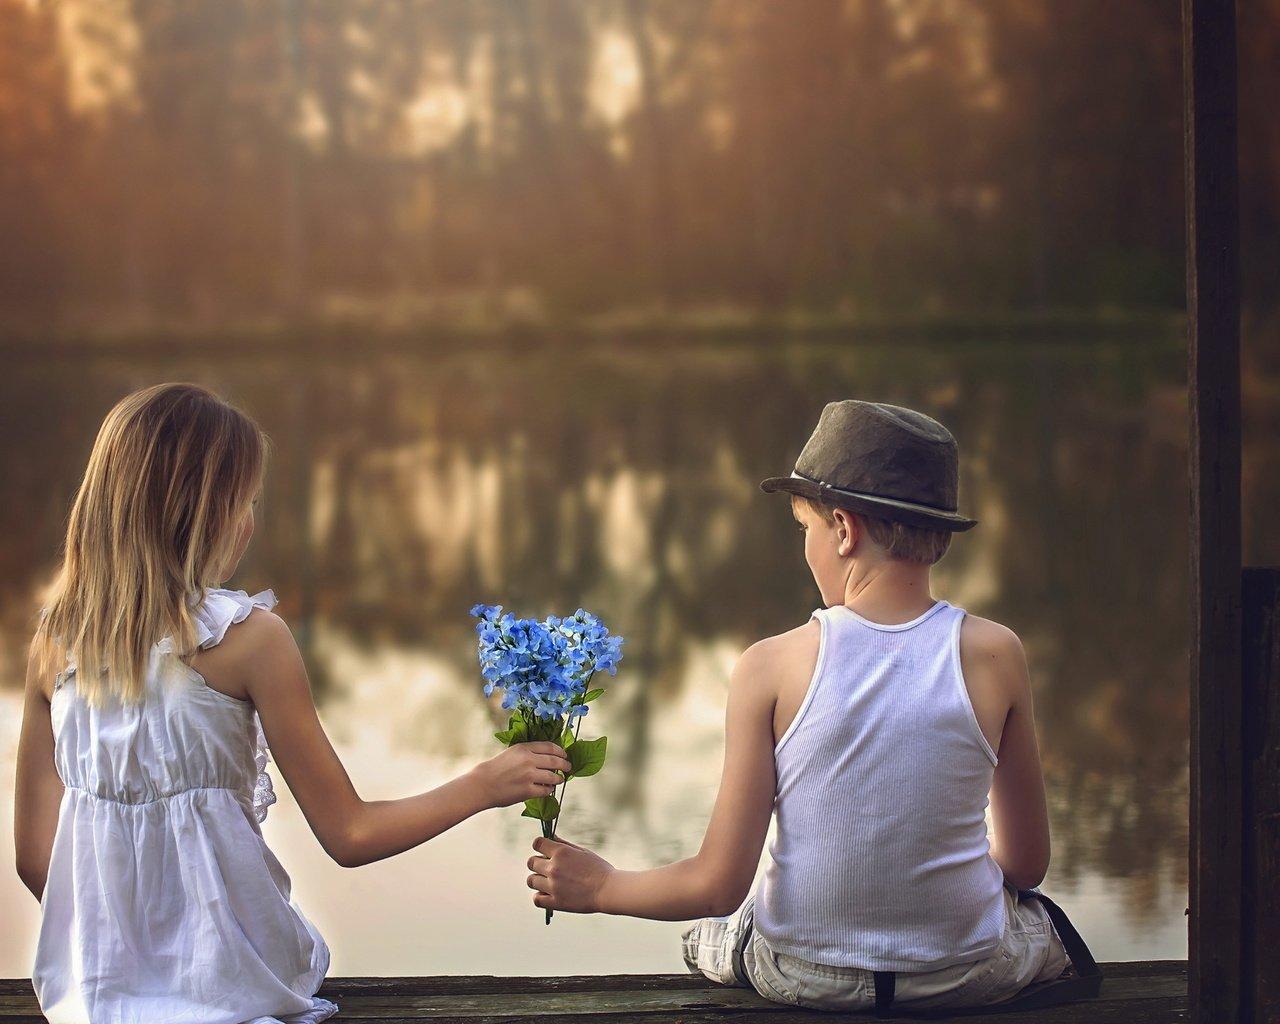 Самой, мальчик дарит девочке цветы картинки